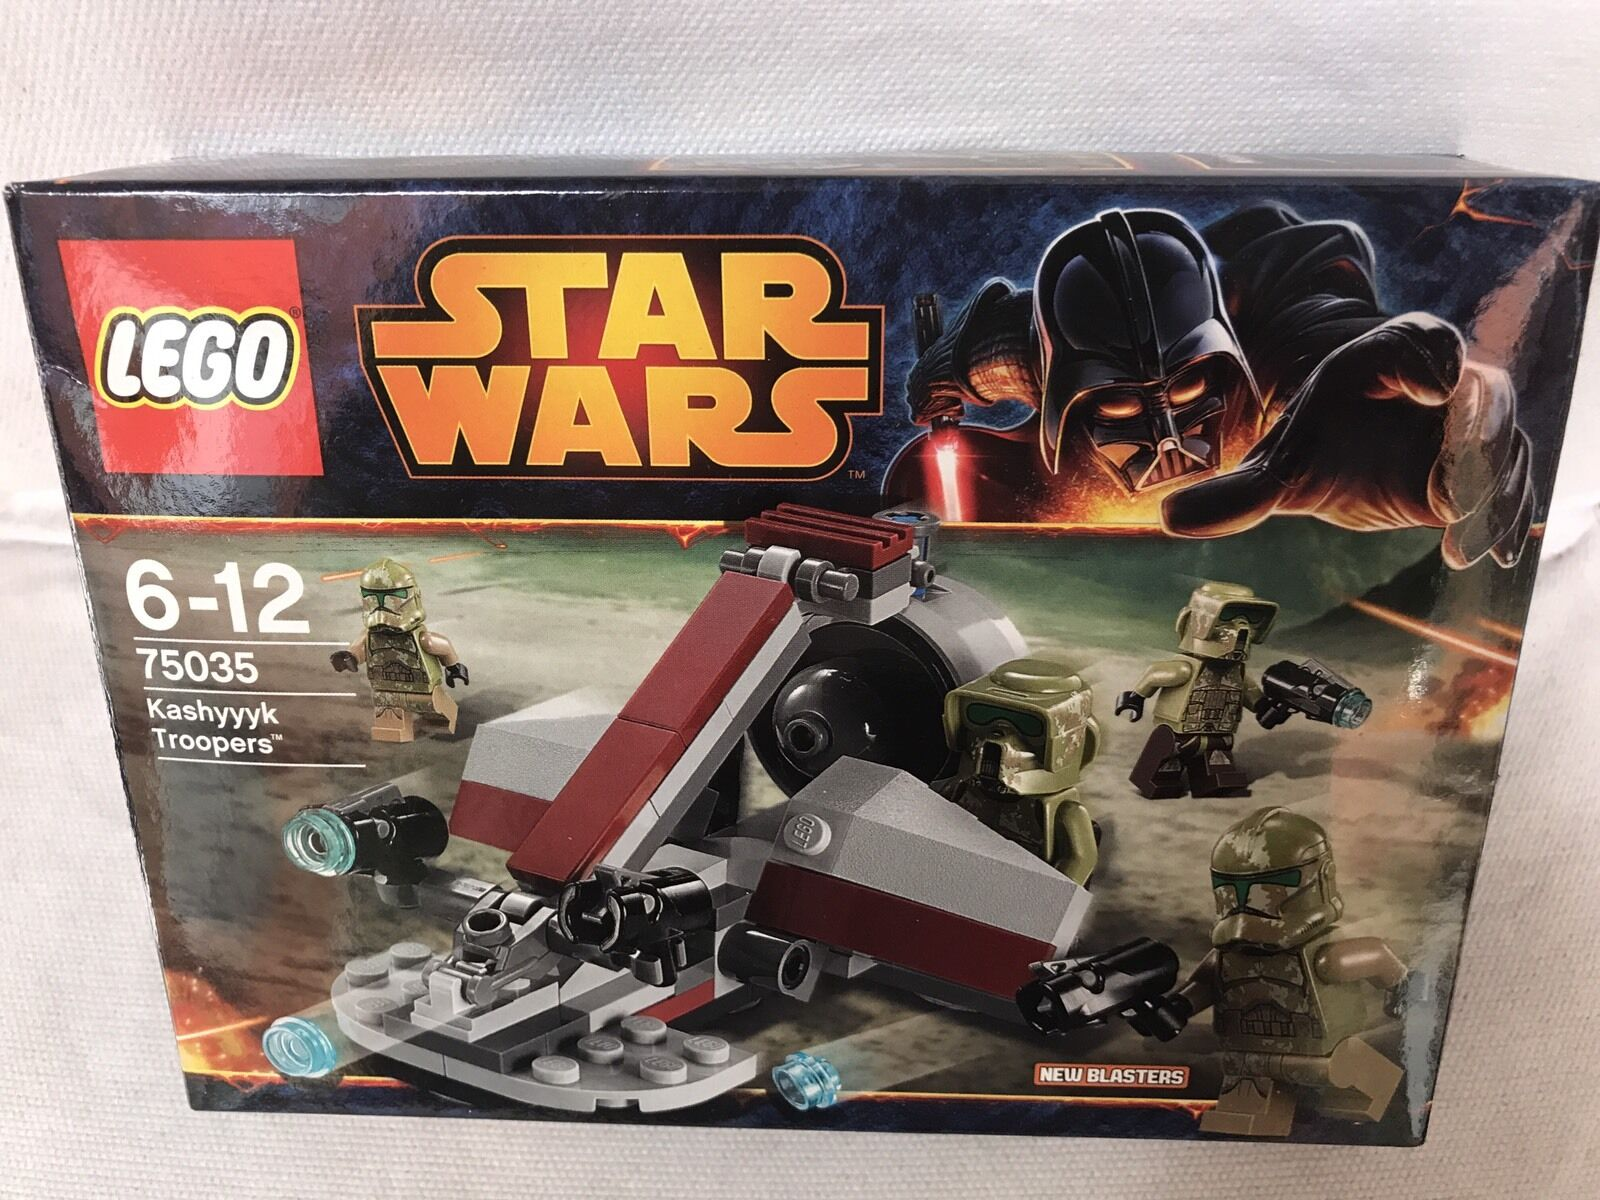 Lego 75035 Star Wars - Kashyyyk Troopers [NEW]